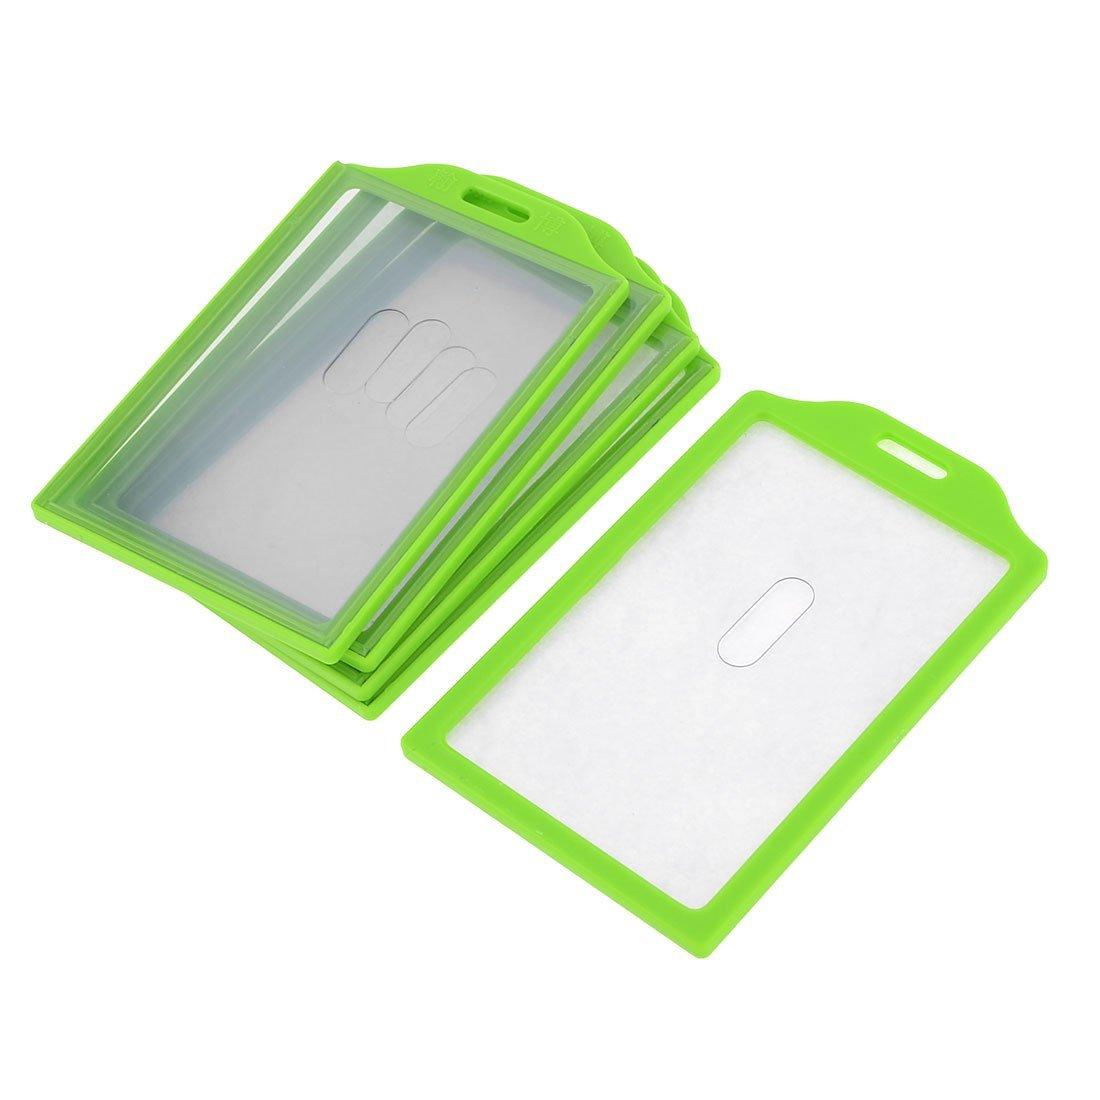 Uxcell Plastic Frame School ID Card Holder, 91 x 59 mm, 5-Piece, Grass Green